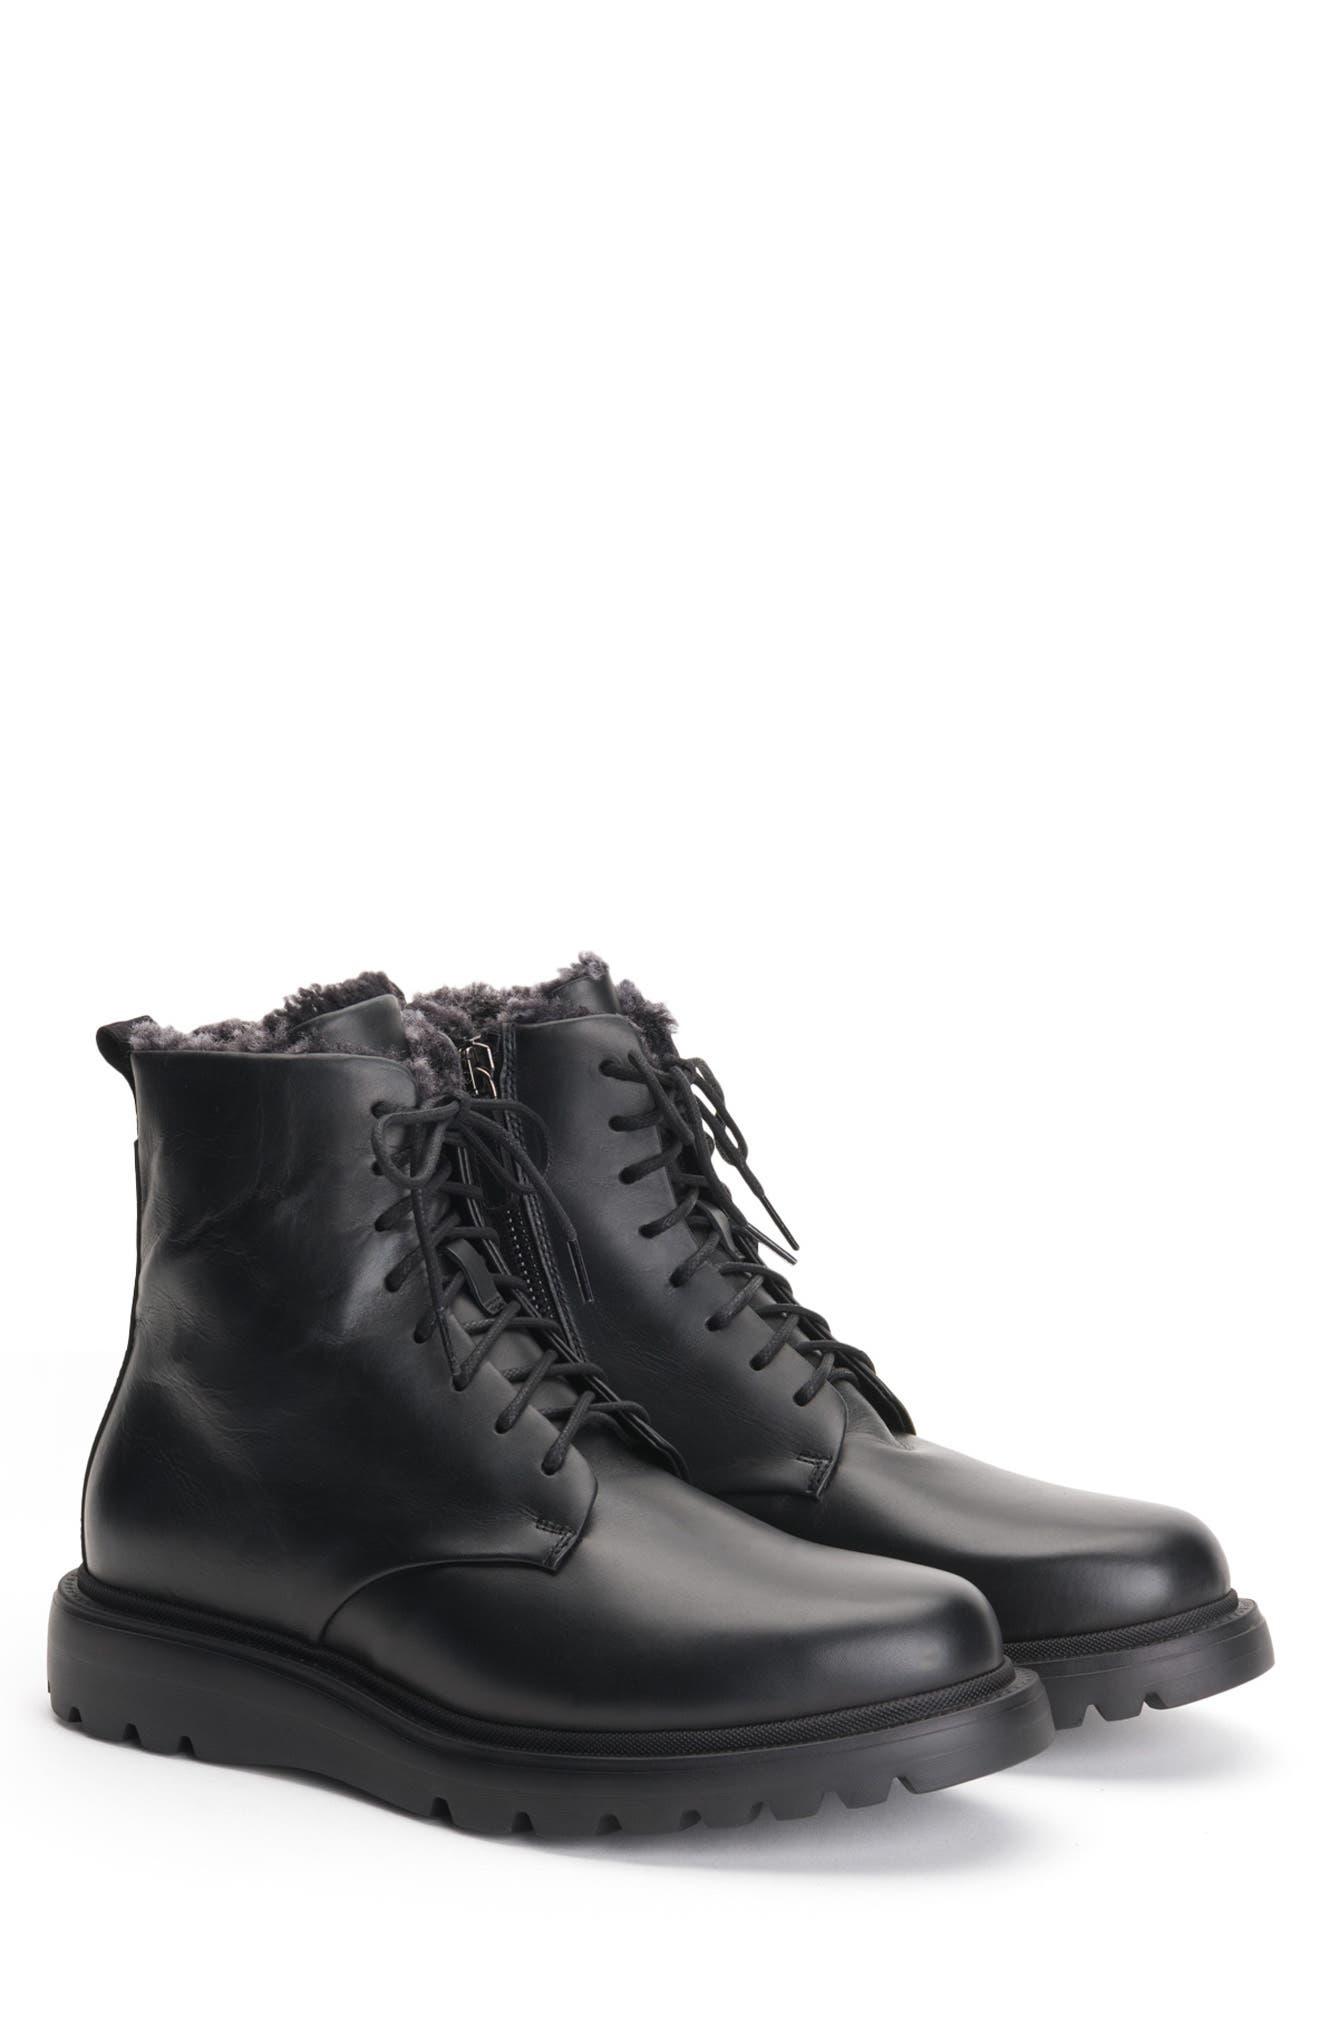 Aquatalia Charles Genuine Shearling Water Resistant Hiking Waterproof Boot- Black